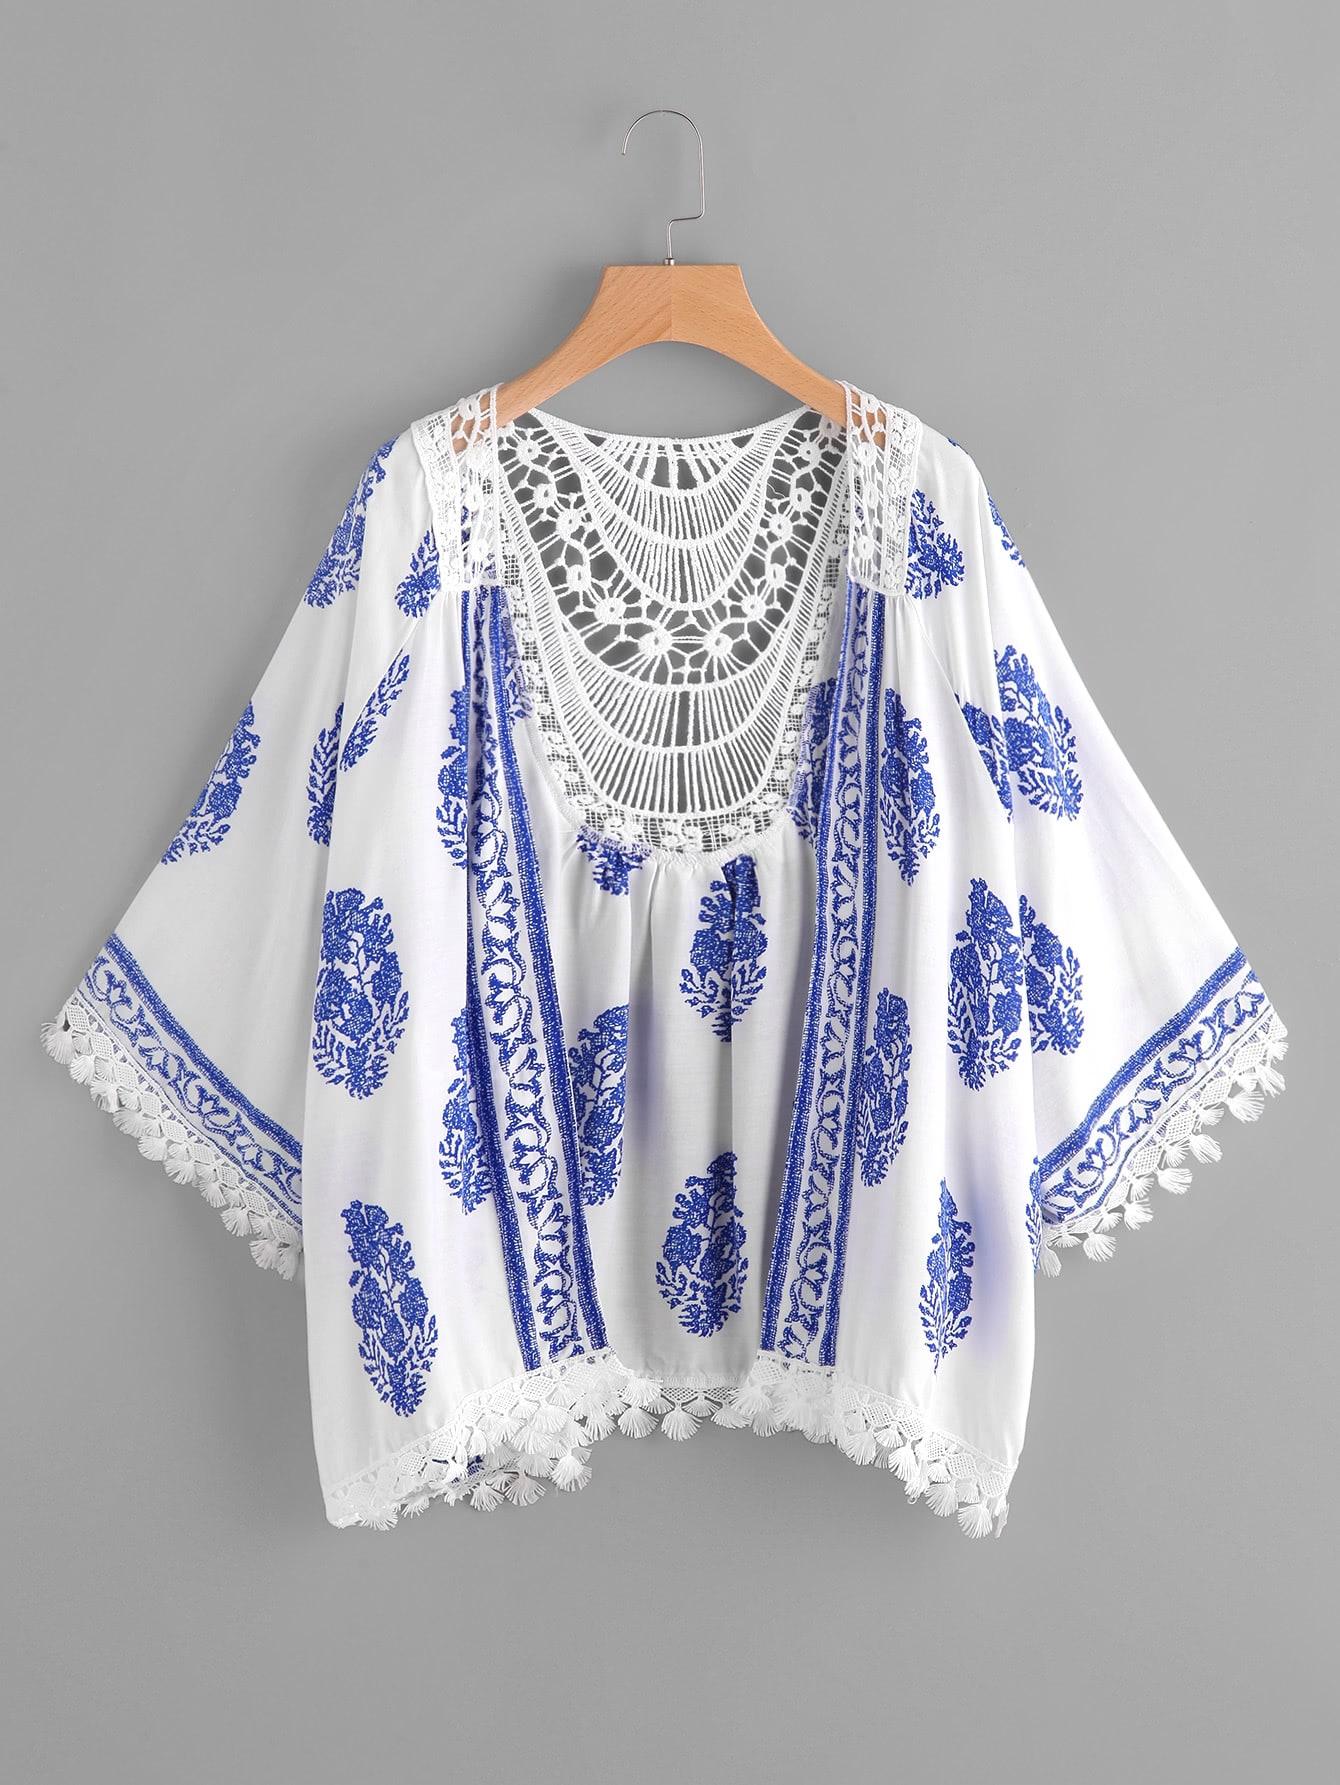 Printed Contrast Crochet Trim Kimono crochet trim sheer lace kimono